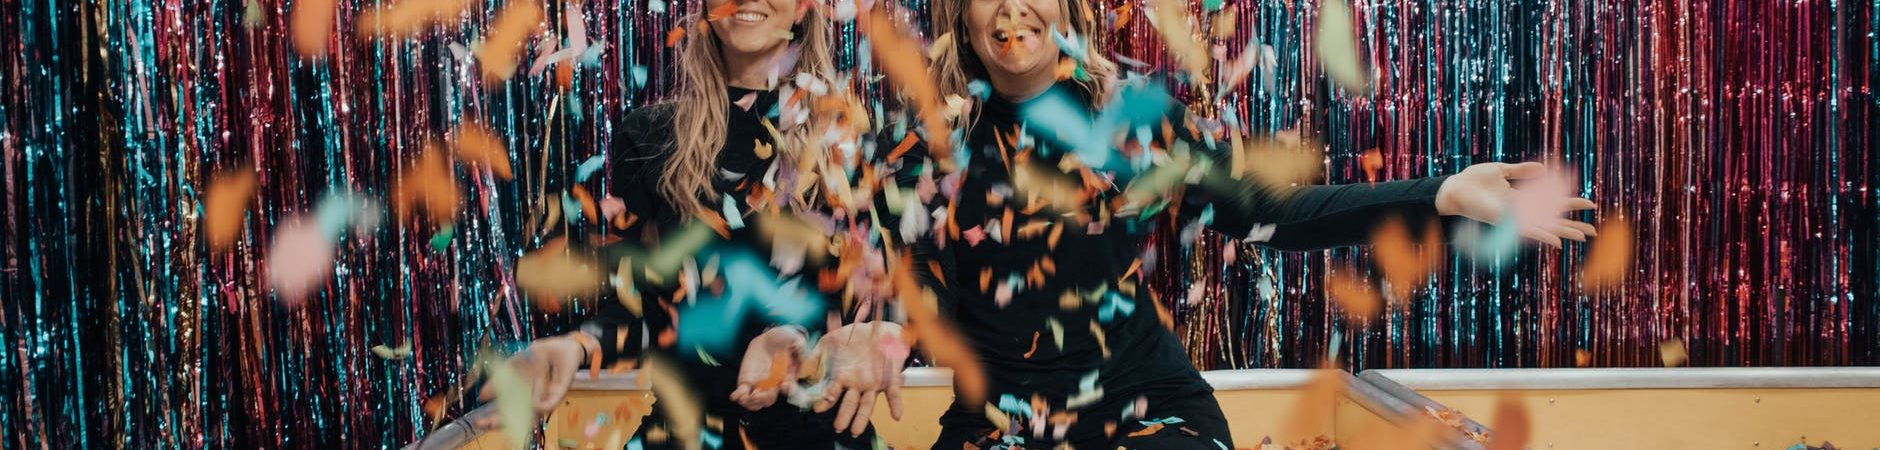 two girls in confetti